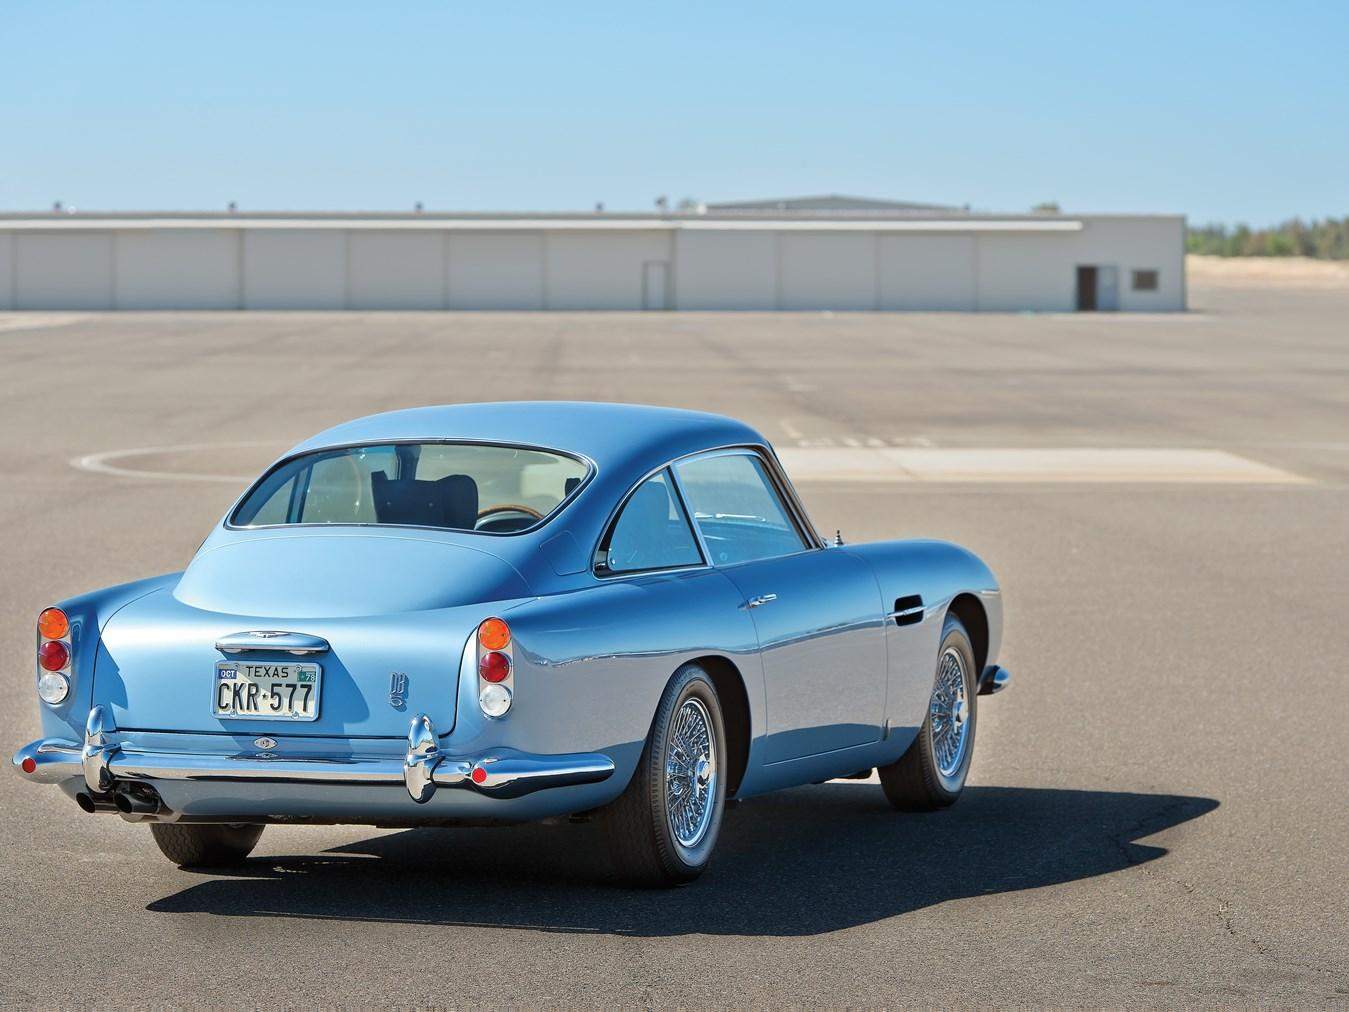 1963 Aston Martin Db4 Seat Belt Manual Images Gallery. rm sotheby s 1965 aston  martin db5 monterey 2014 rh rmsothebys com